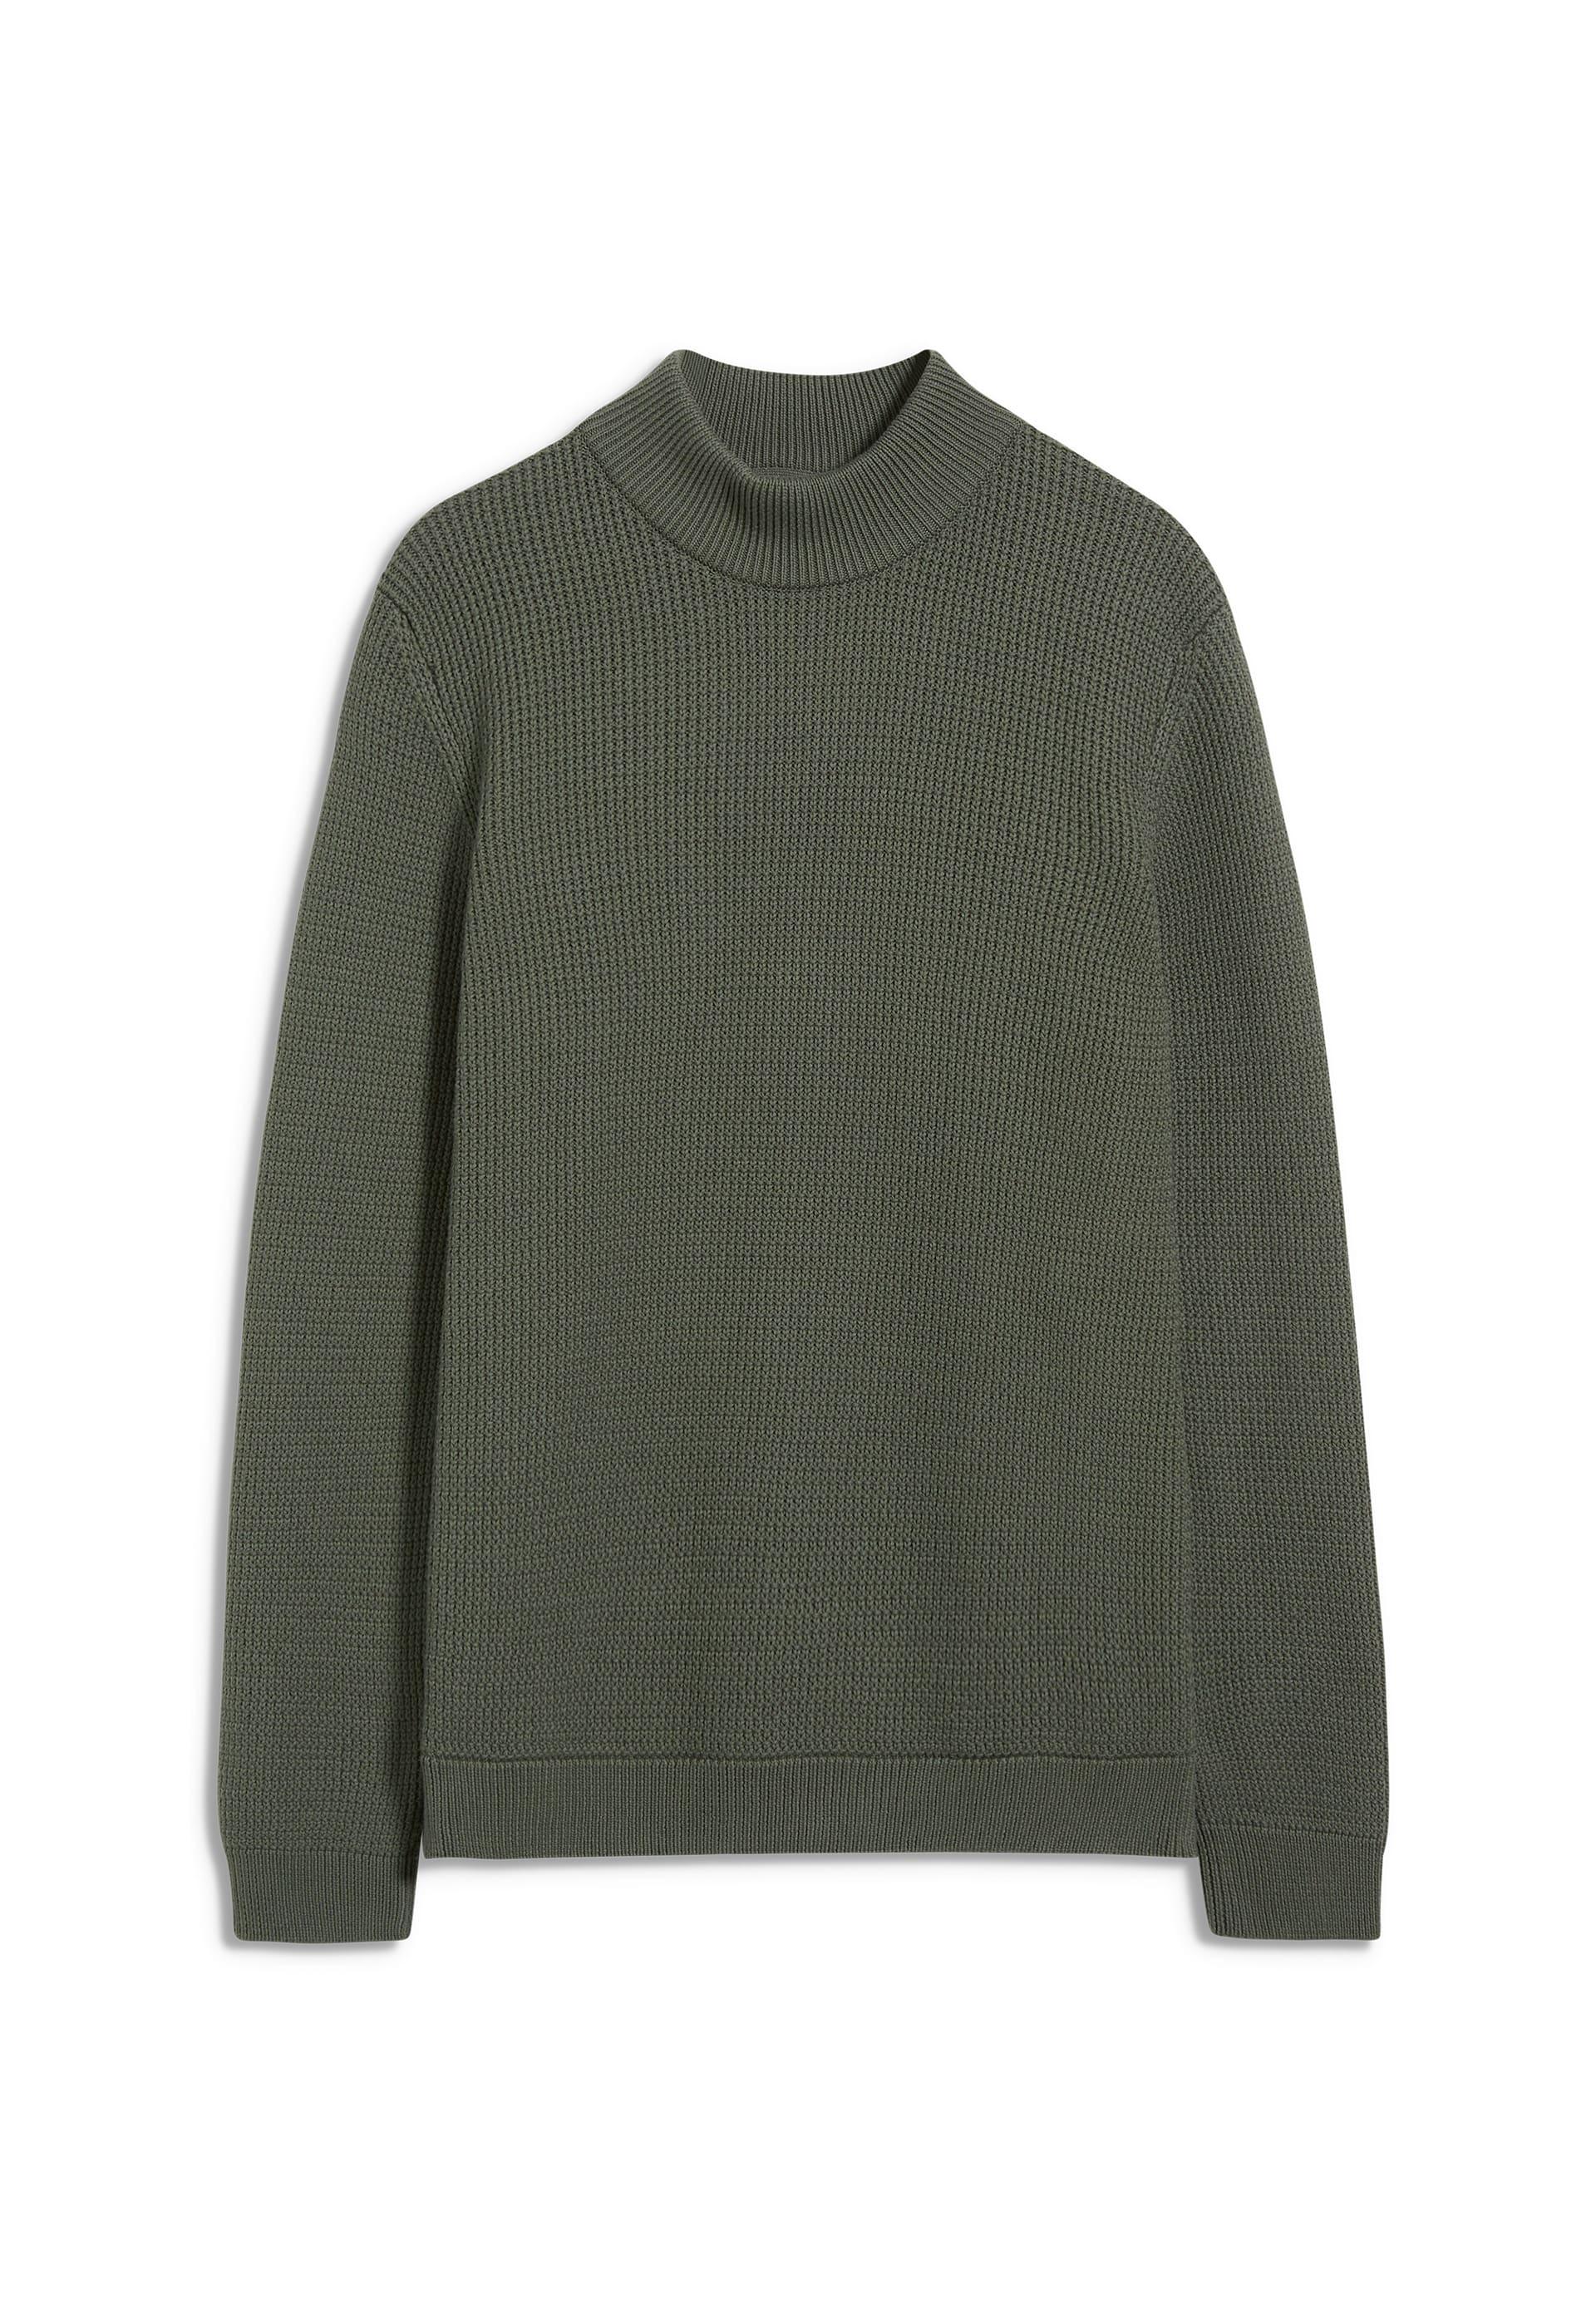 IVAAR Sweater made of Organic Cotton